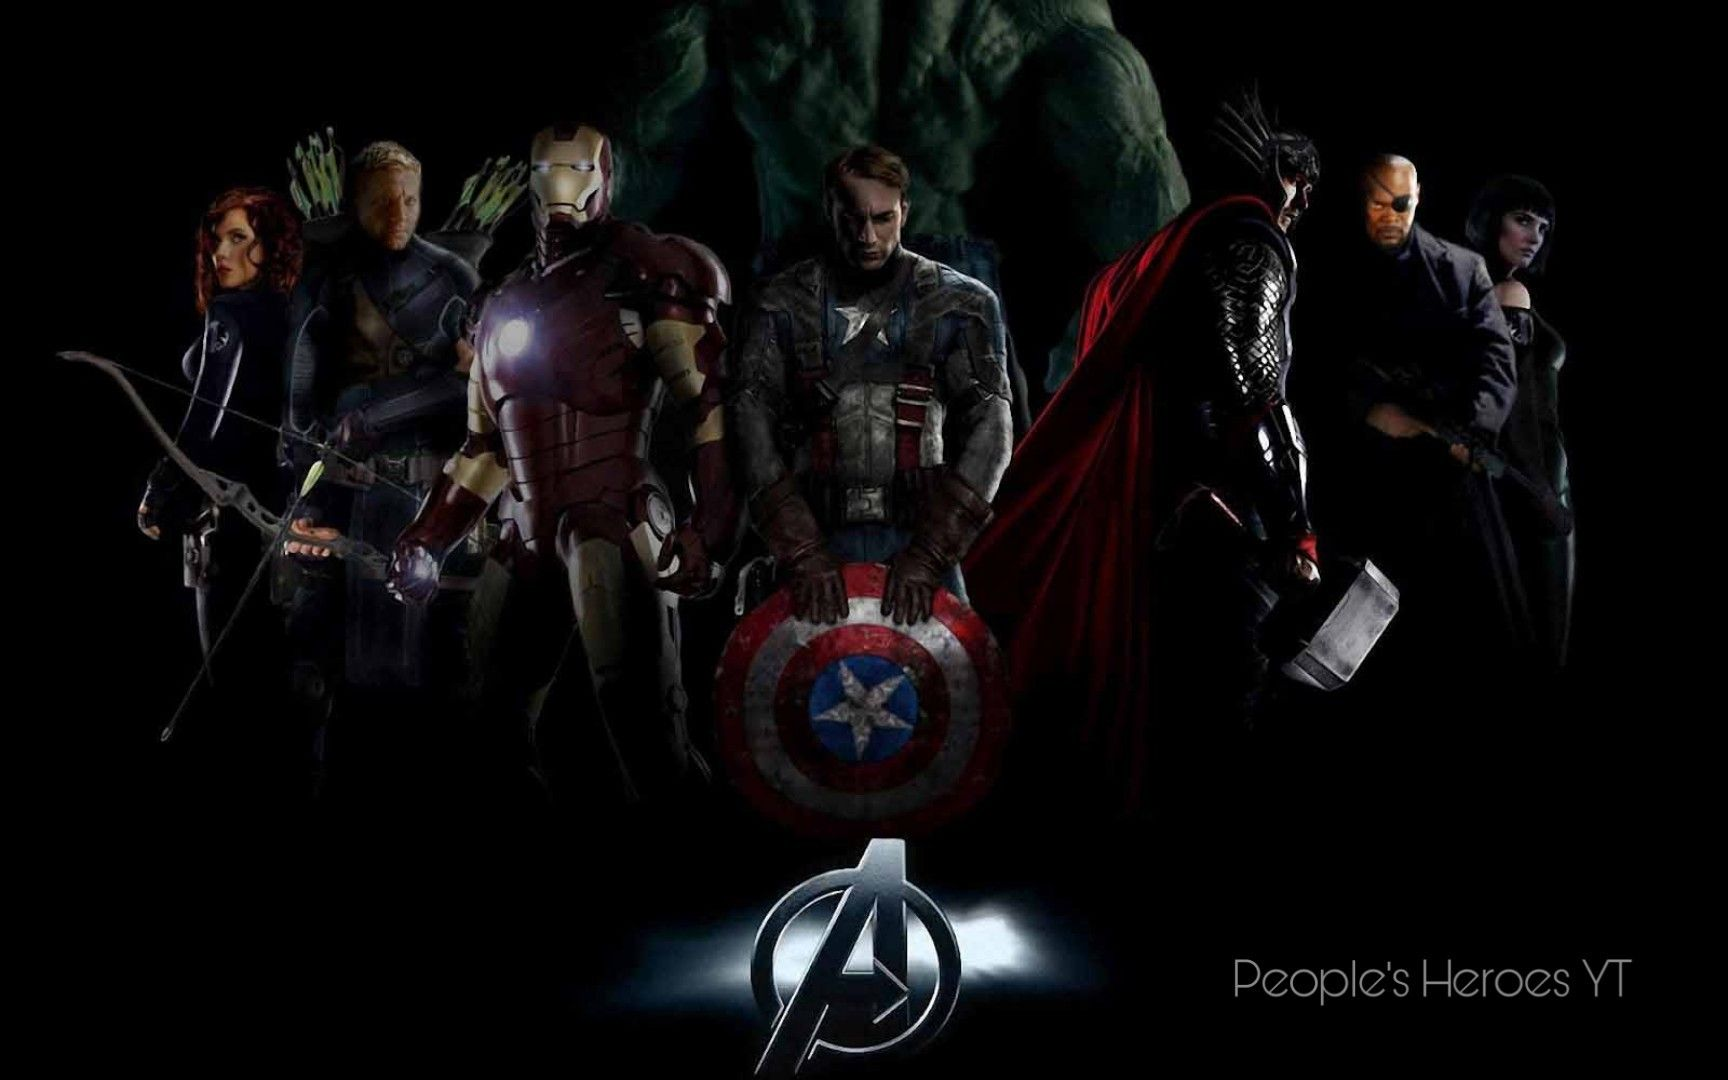 Avengers Wallpapers Hd Avengers Wallpaper Avengers Pictures Marvel Comics Wallpaper